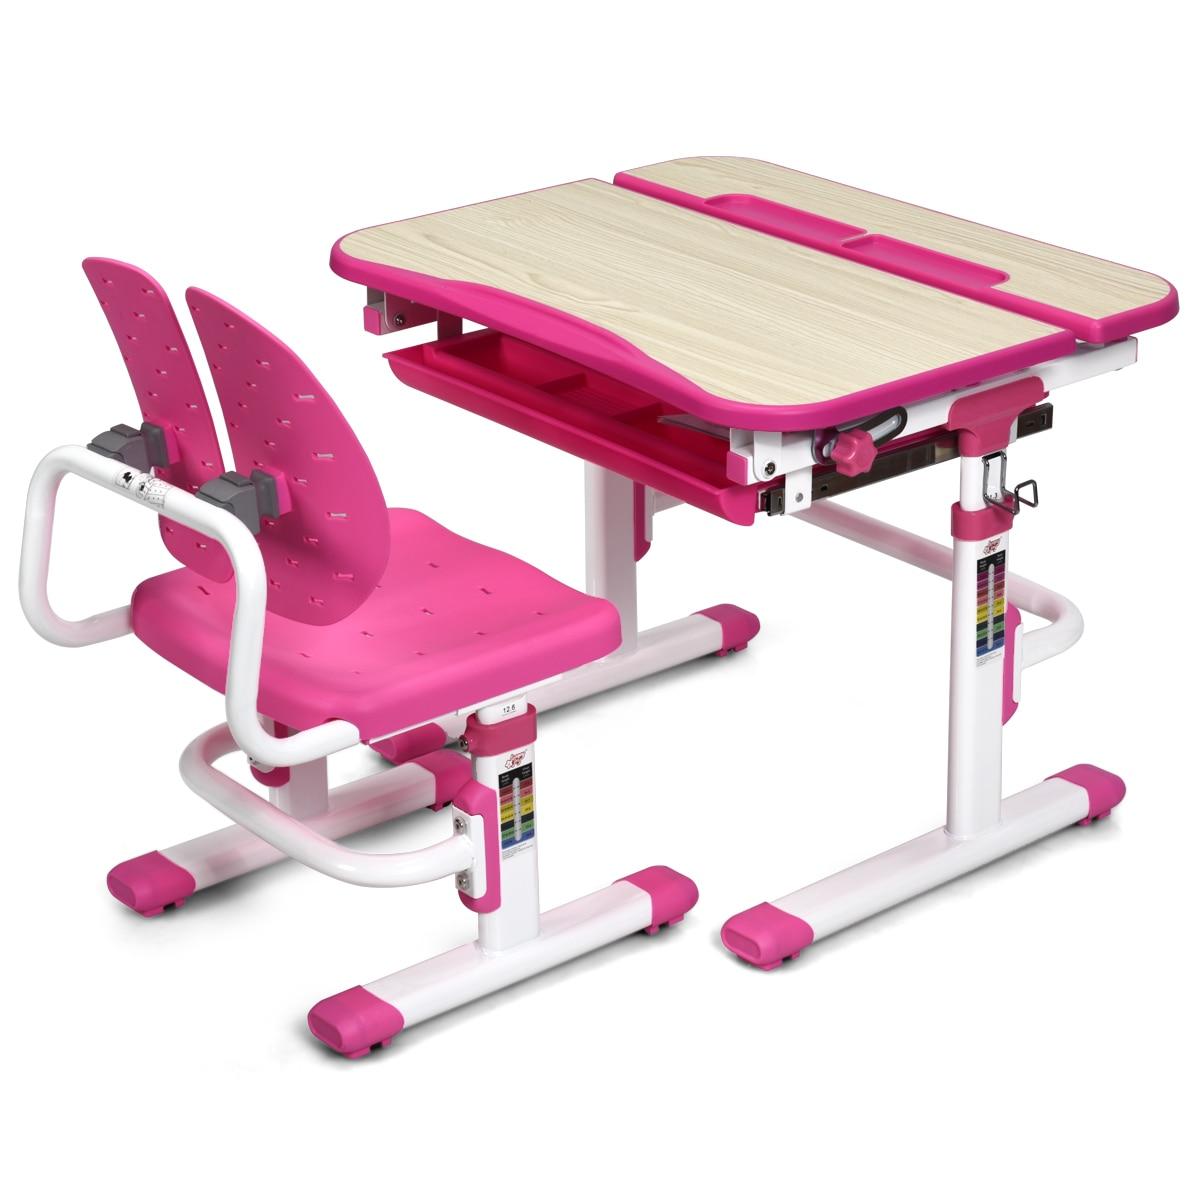 Costway Children Desk Chair Set Adjustable Study Table Drawer Winged Backrest Chair